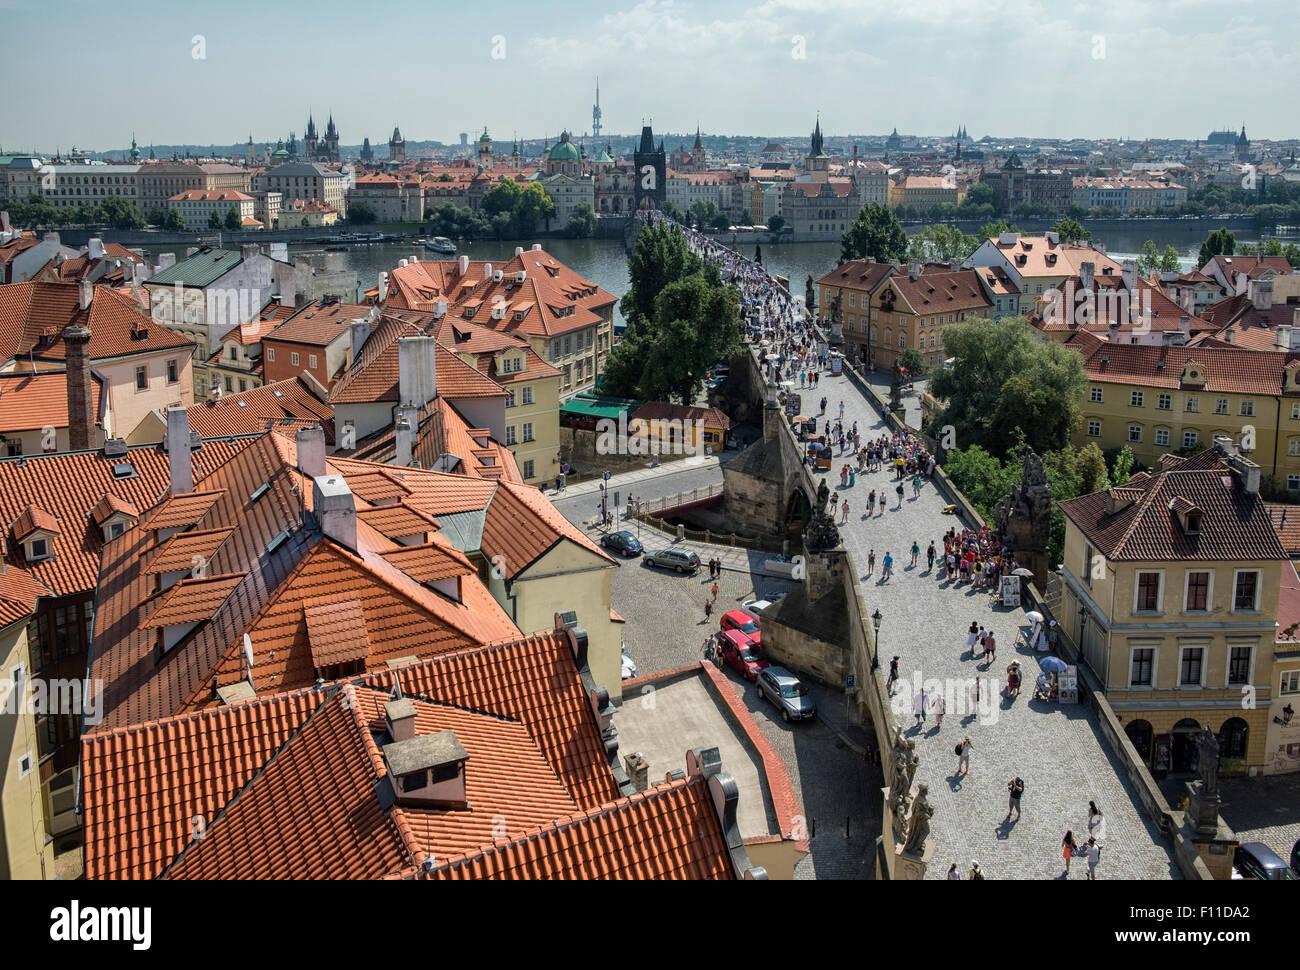 Charles Bridge (Karluv most) - a bridge over the Vltava river in Prague, Czech Republic, Europe - Stock Image